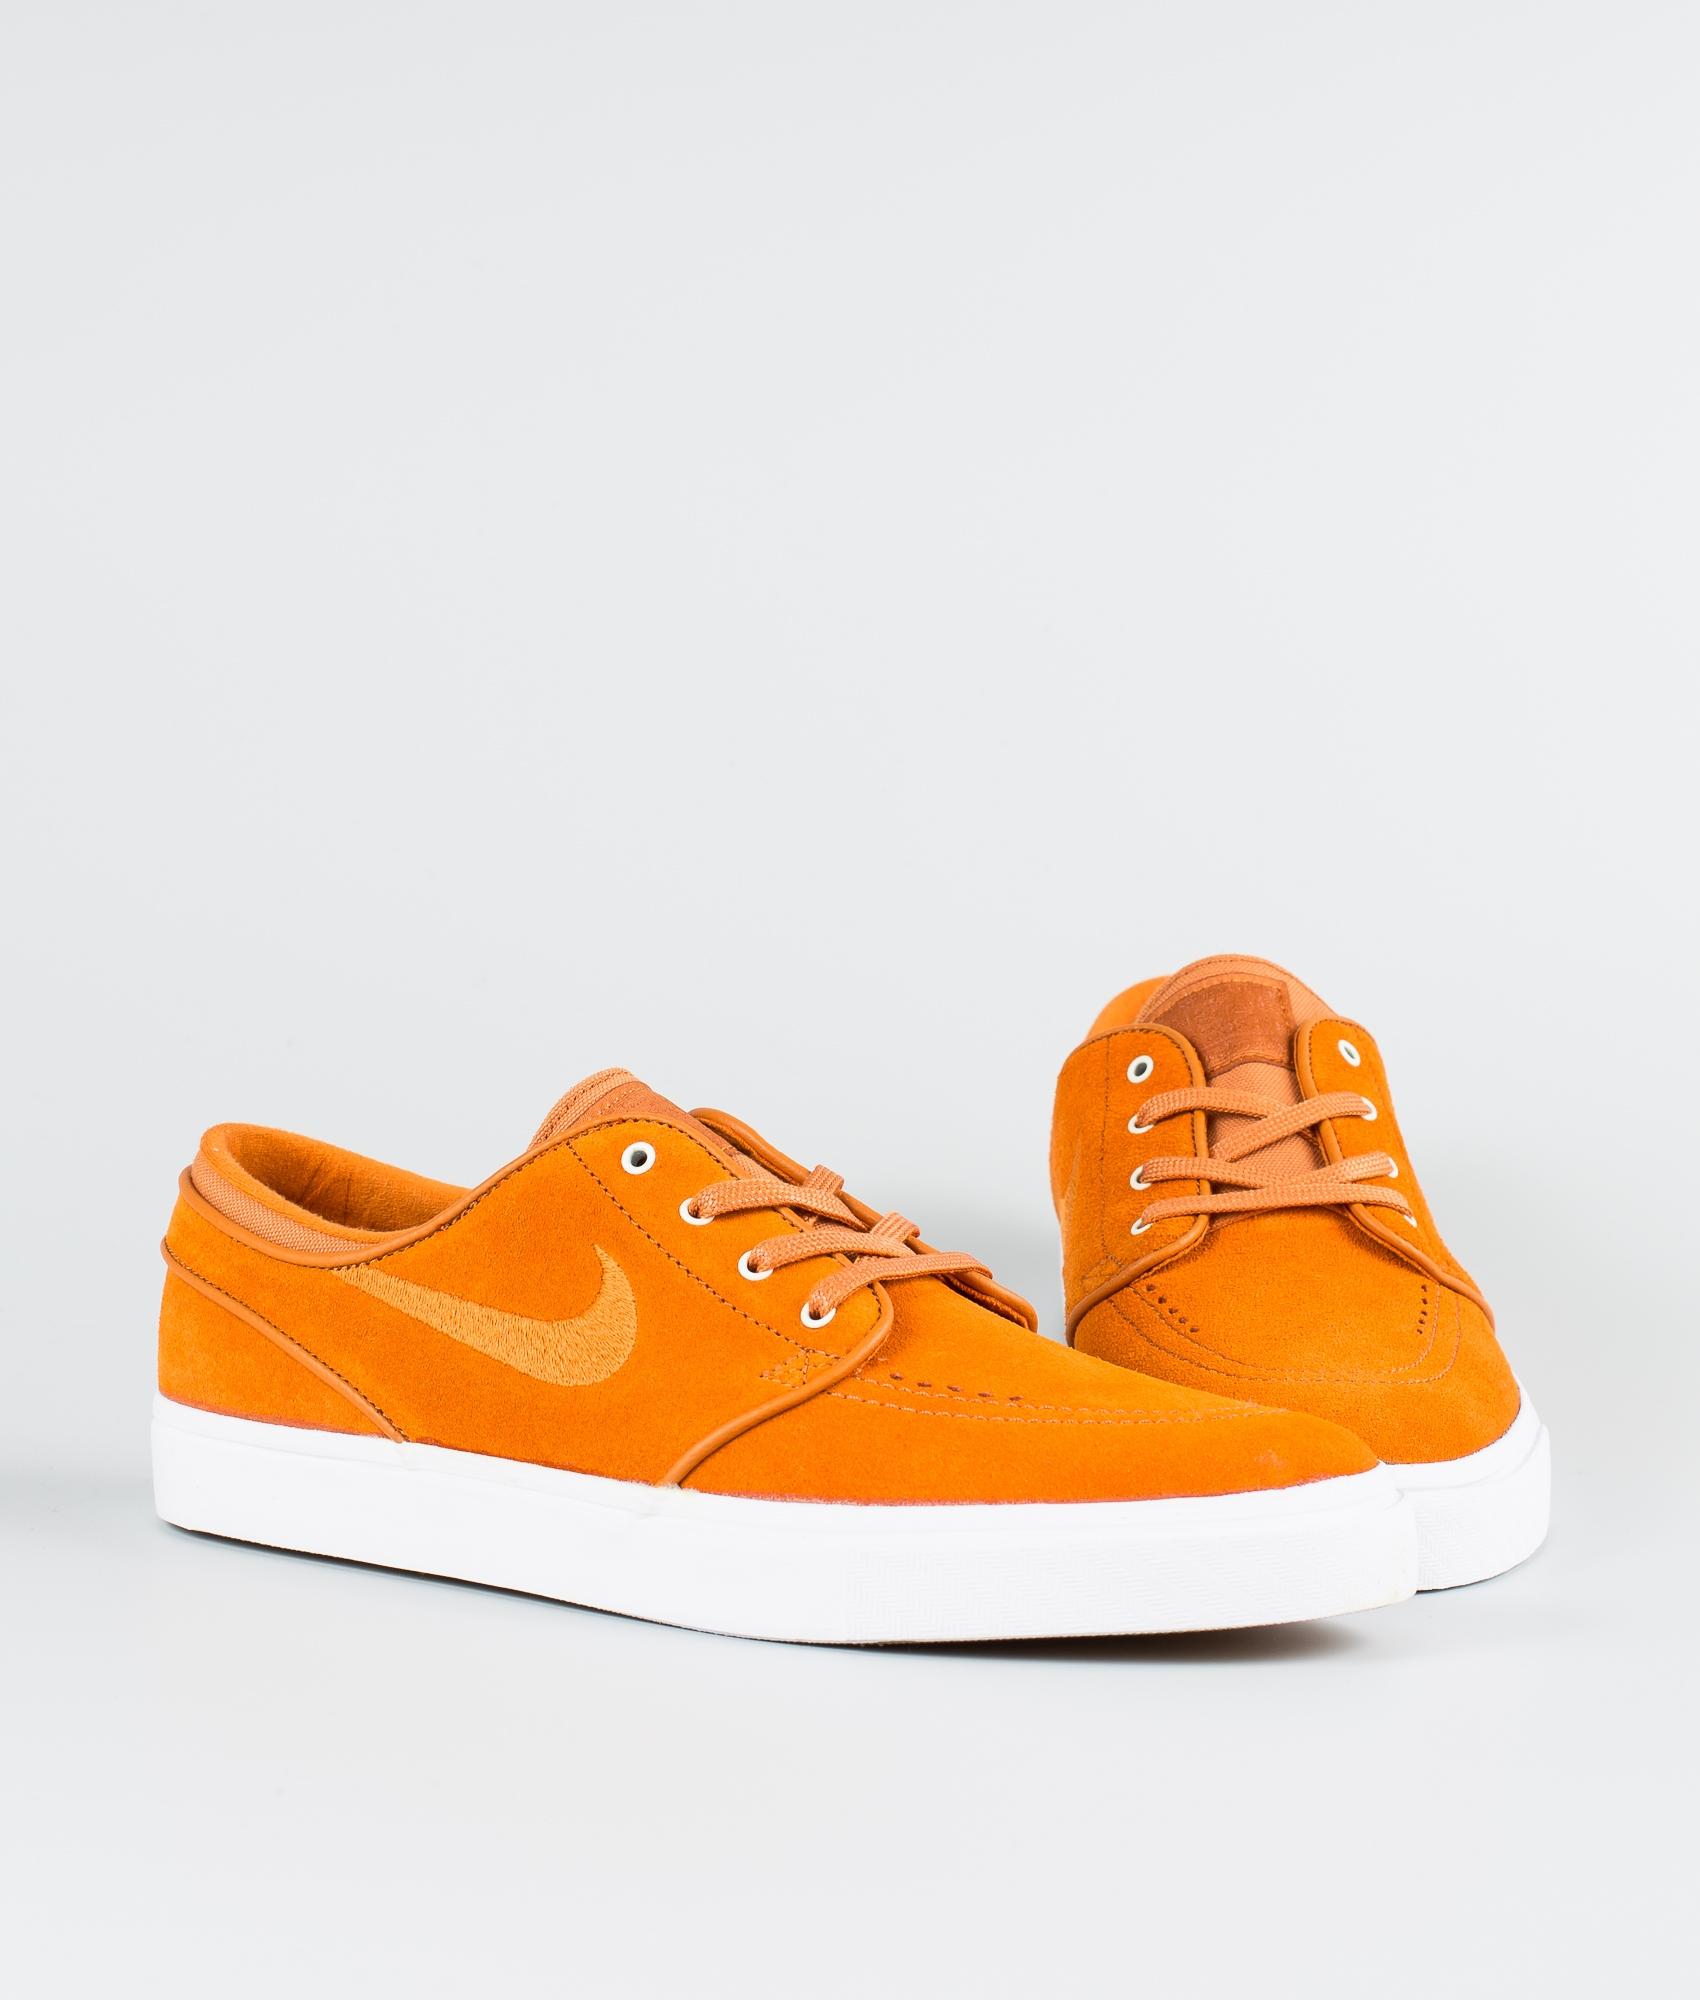 White Cinder Orangecinder Orange Nike Zoom Stefan Sko Janoski QthrdCs